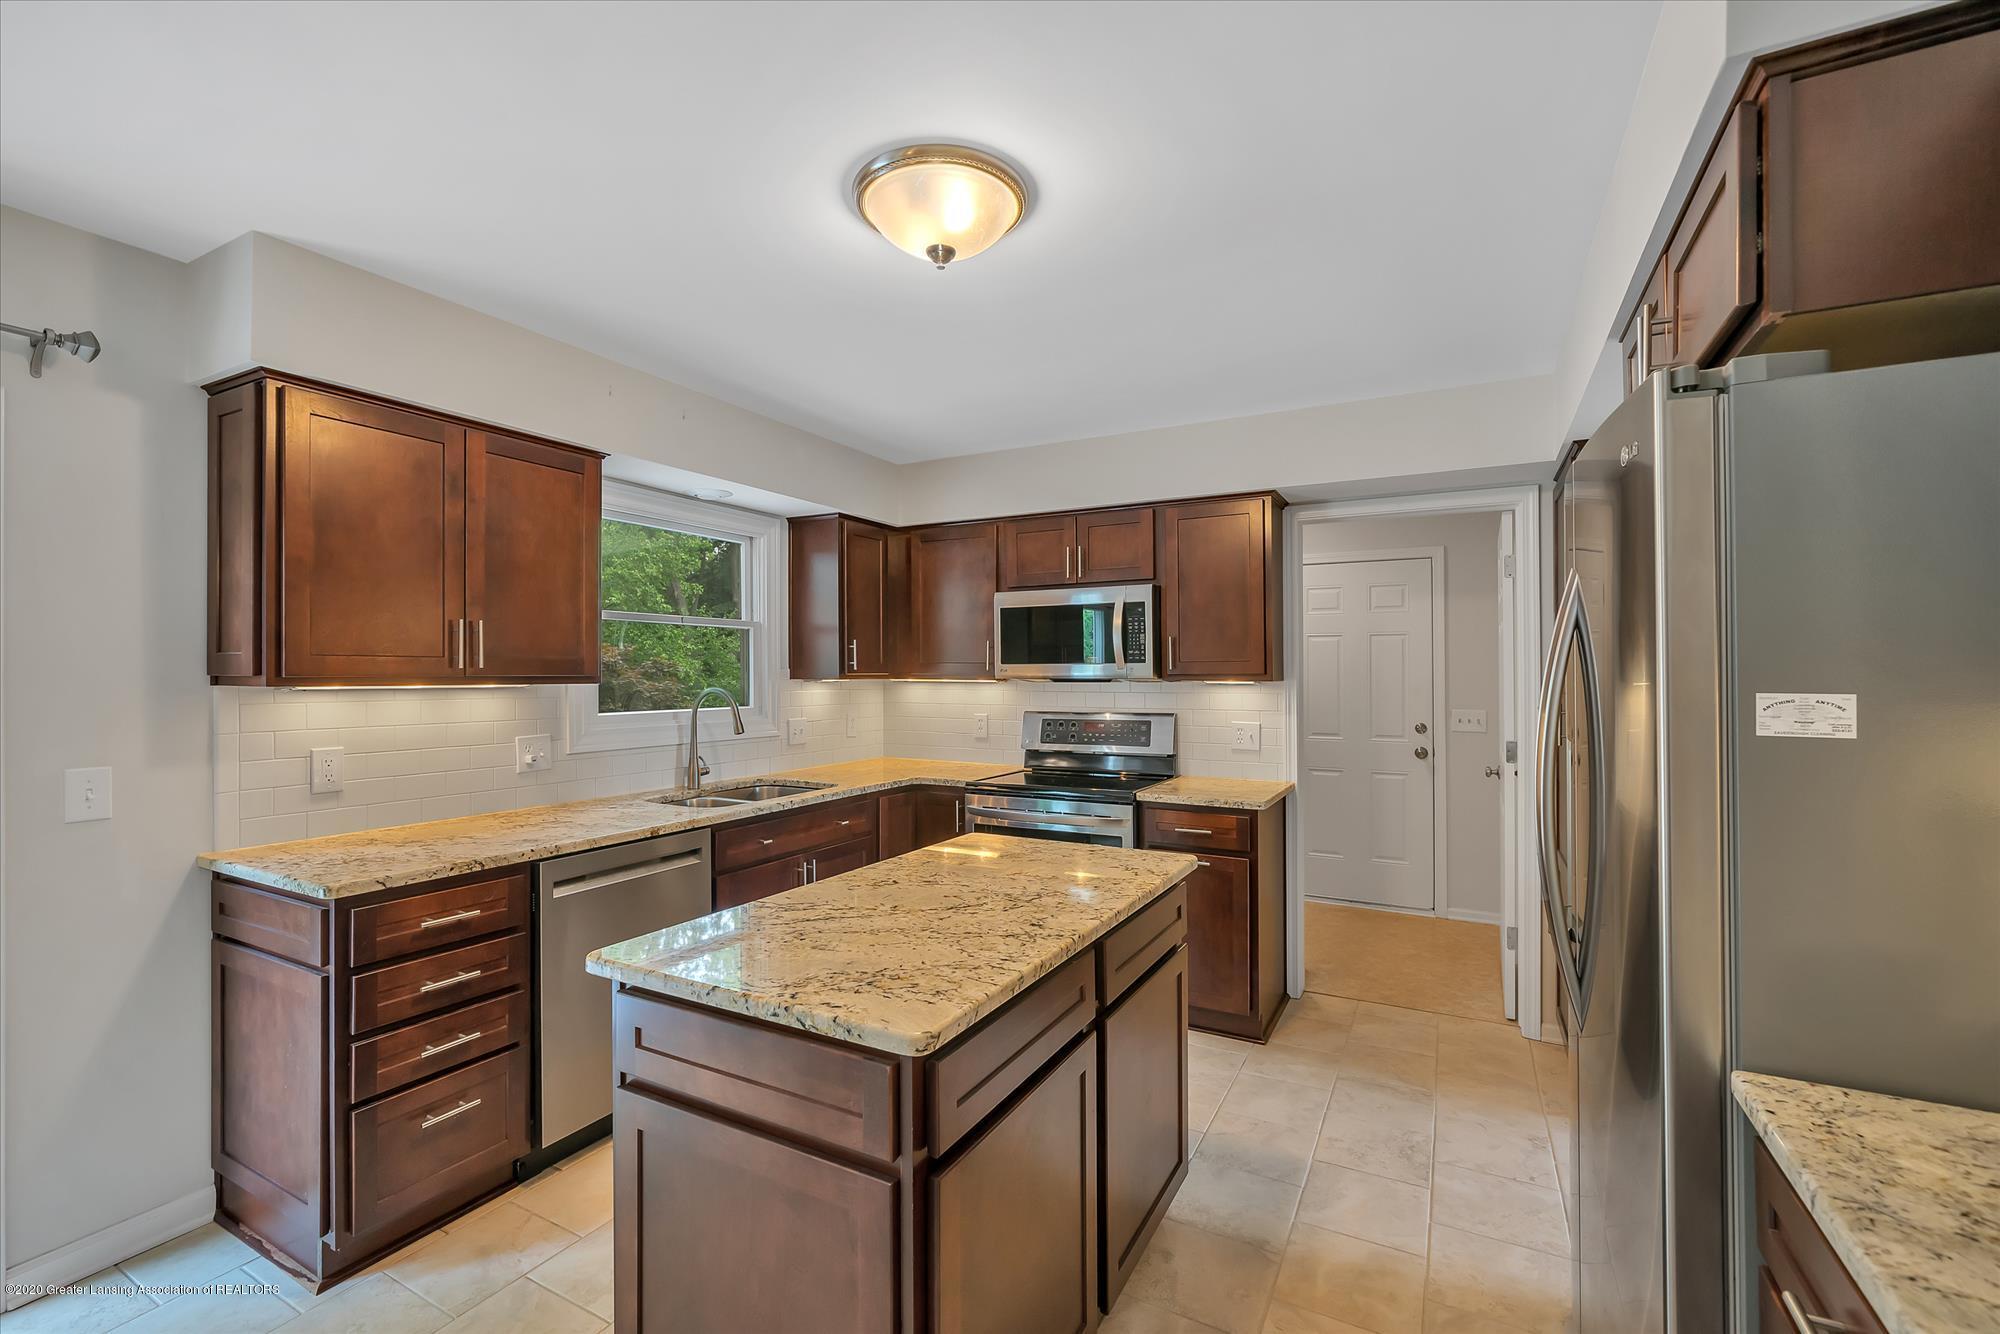 1606 Birchwood Dr - Beautifully remodeled kitchen - 10